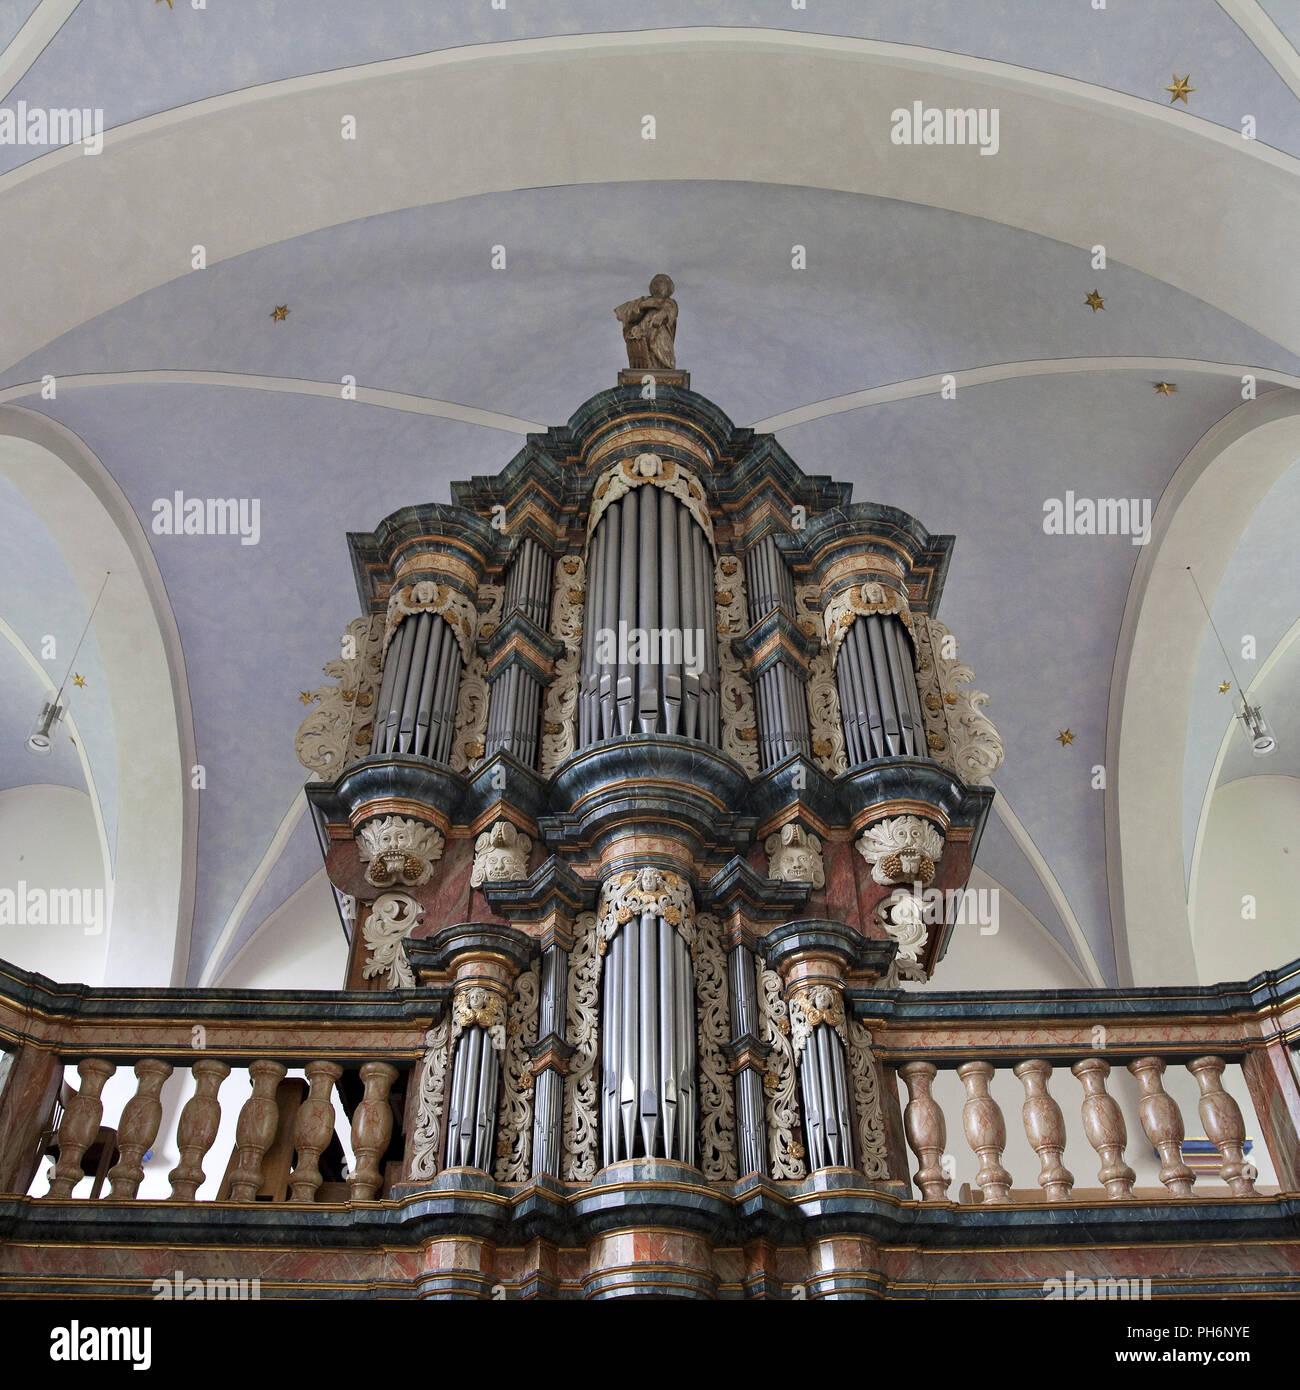 Órgano, St. Pankratuis iglesia, Moehnesee, Alemania Imagen De Stock